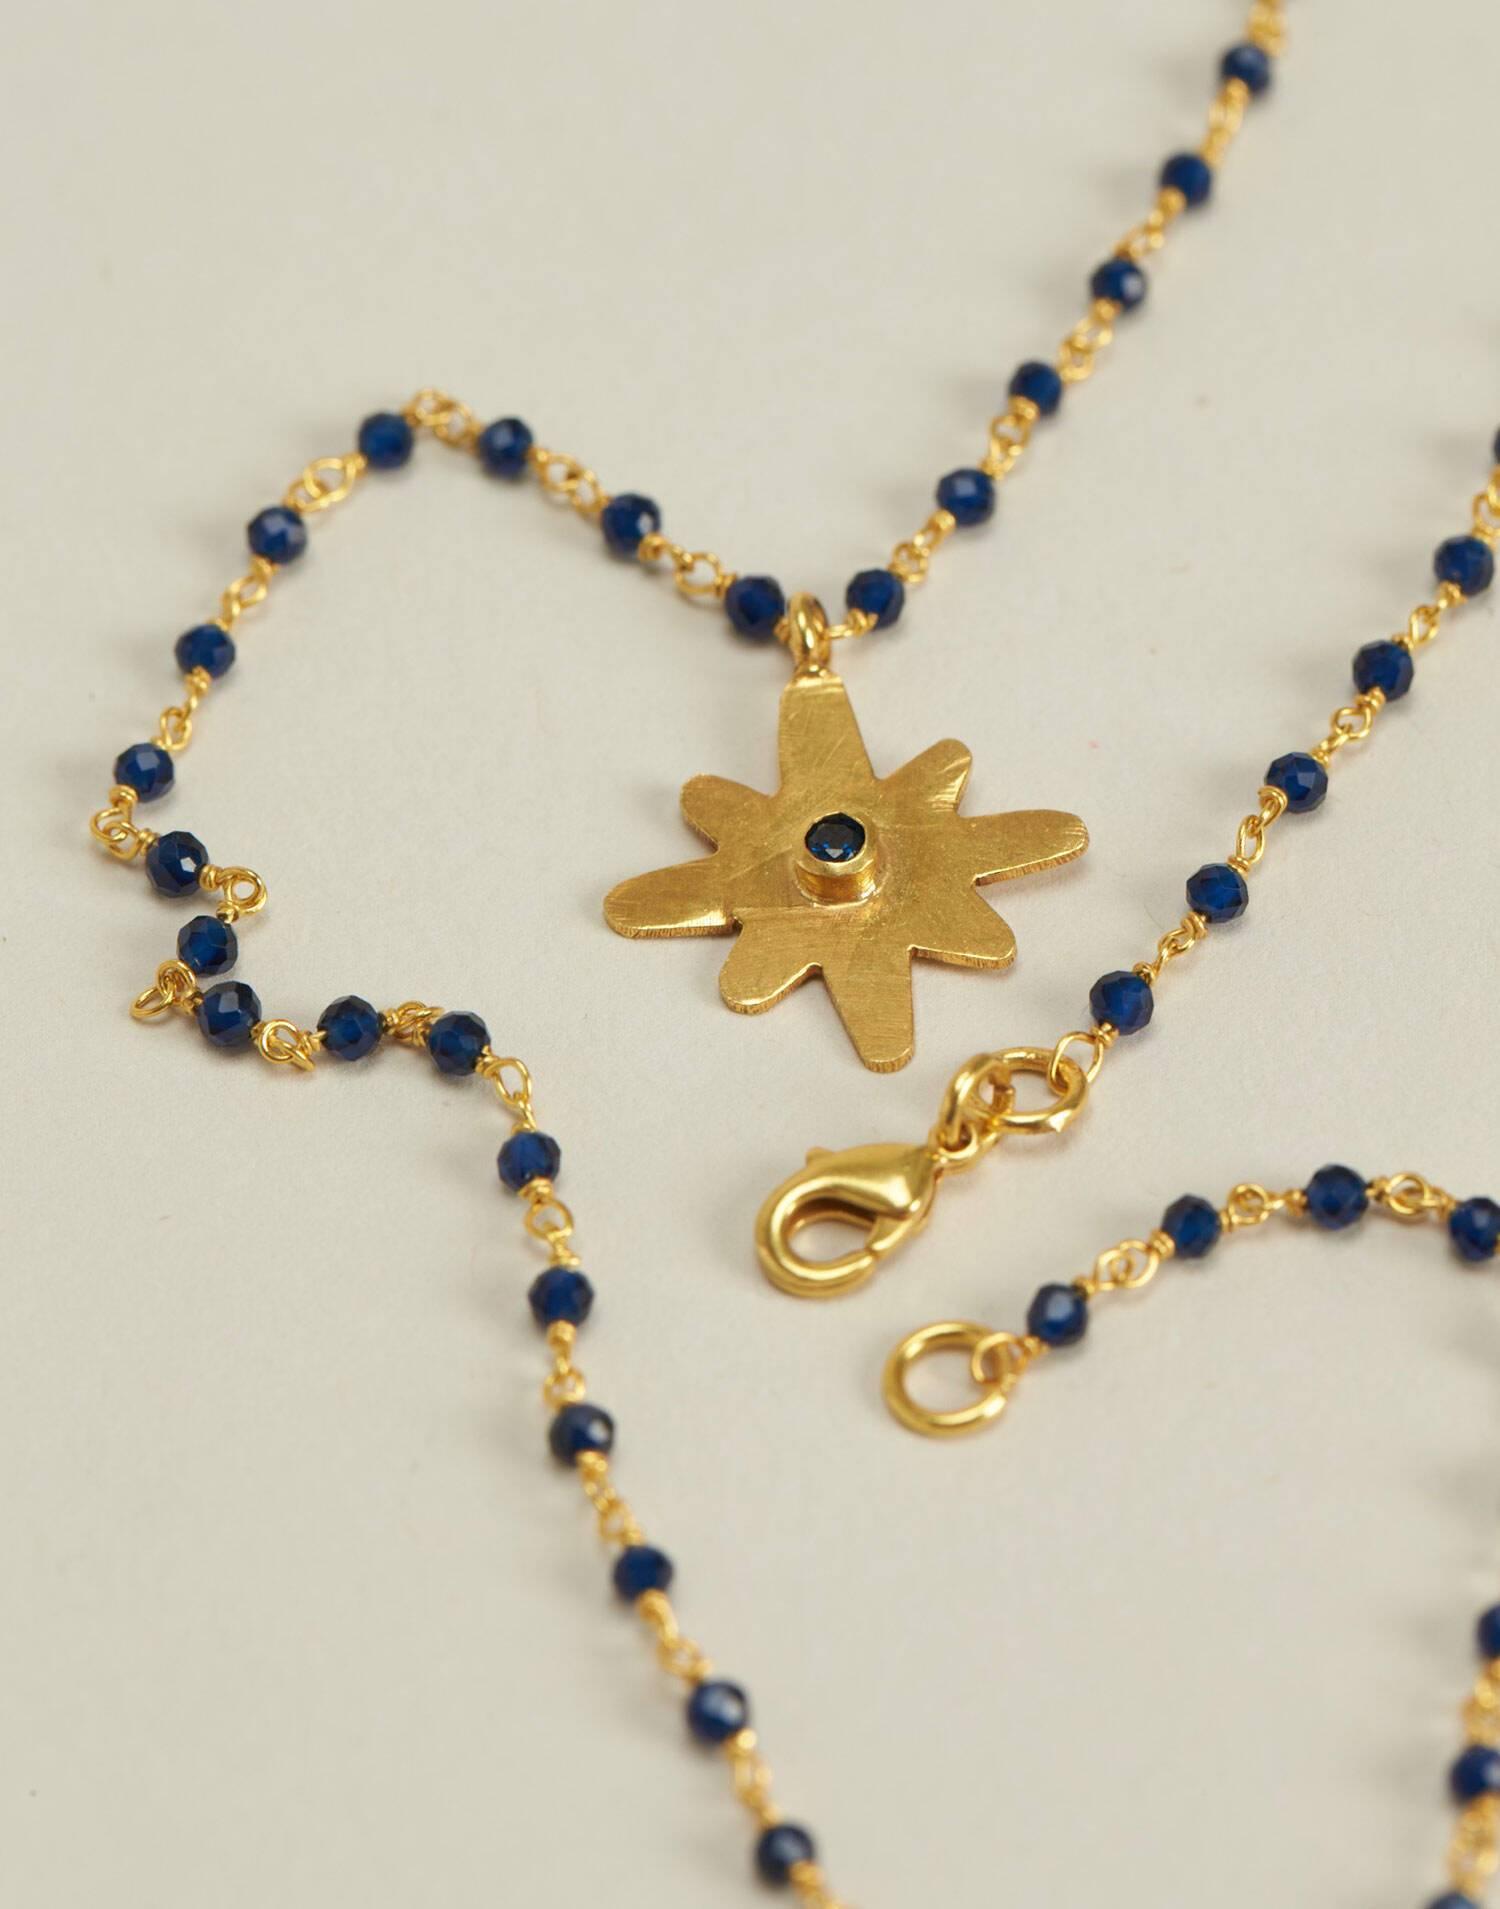 Collar medalla estrella baño de oro